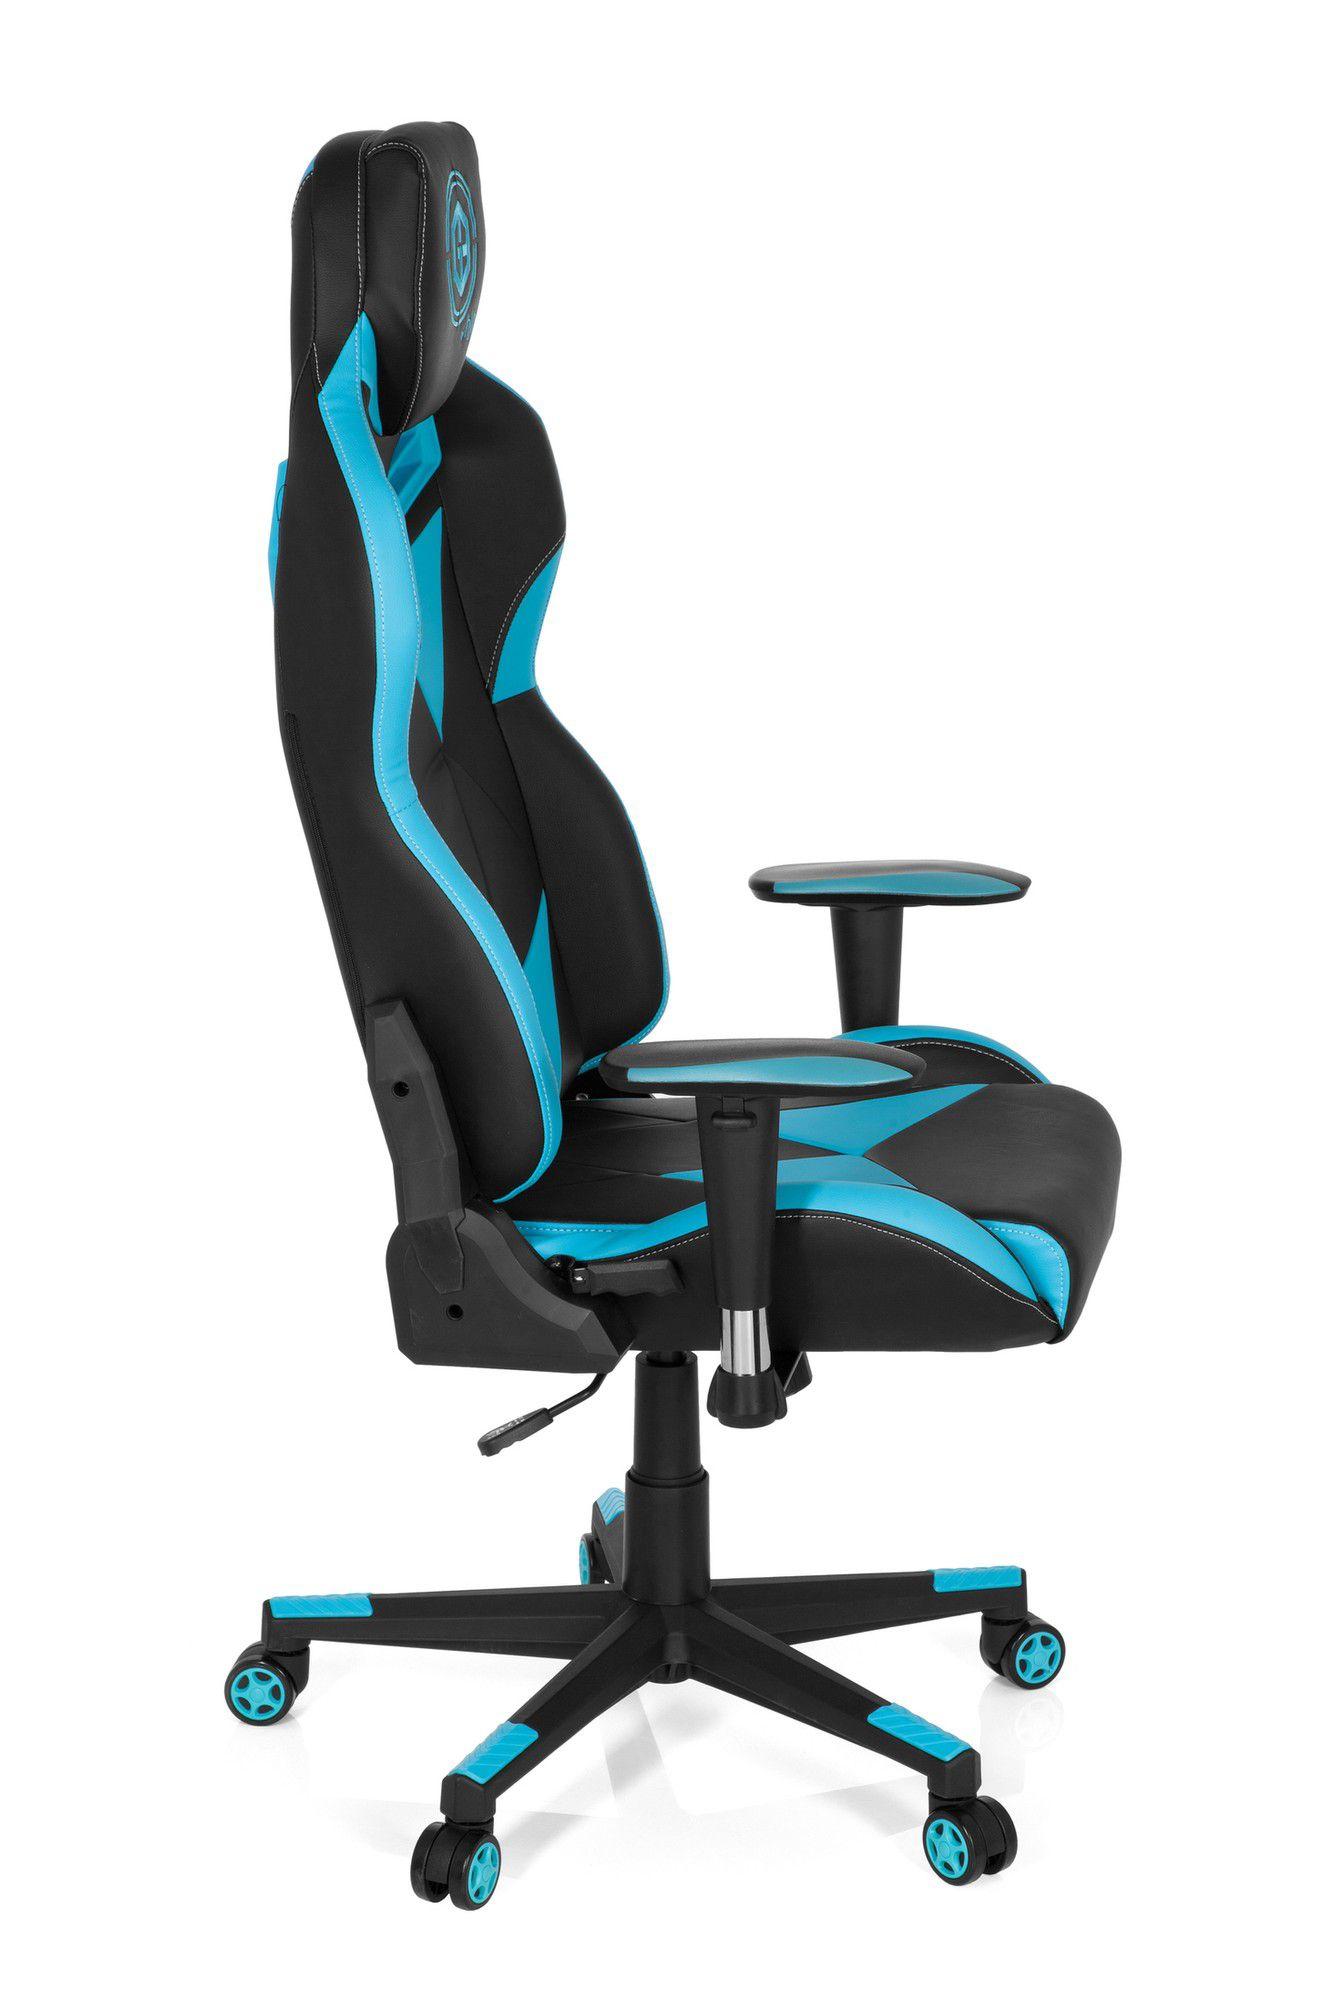 gaming stuhl b rostuhl gamebreaker sx 03 kunstleder schwarz blau hjh office b2b deutschland. Black Bedroom Furniture Sets. Home Design Ideas